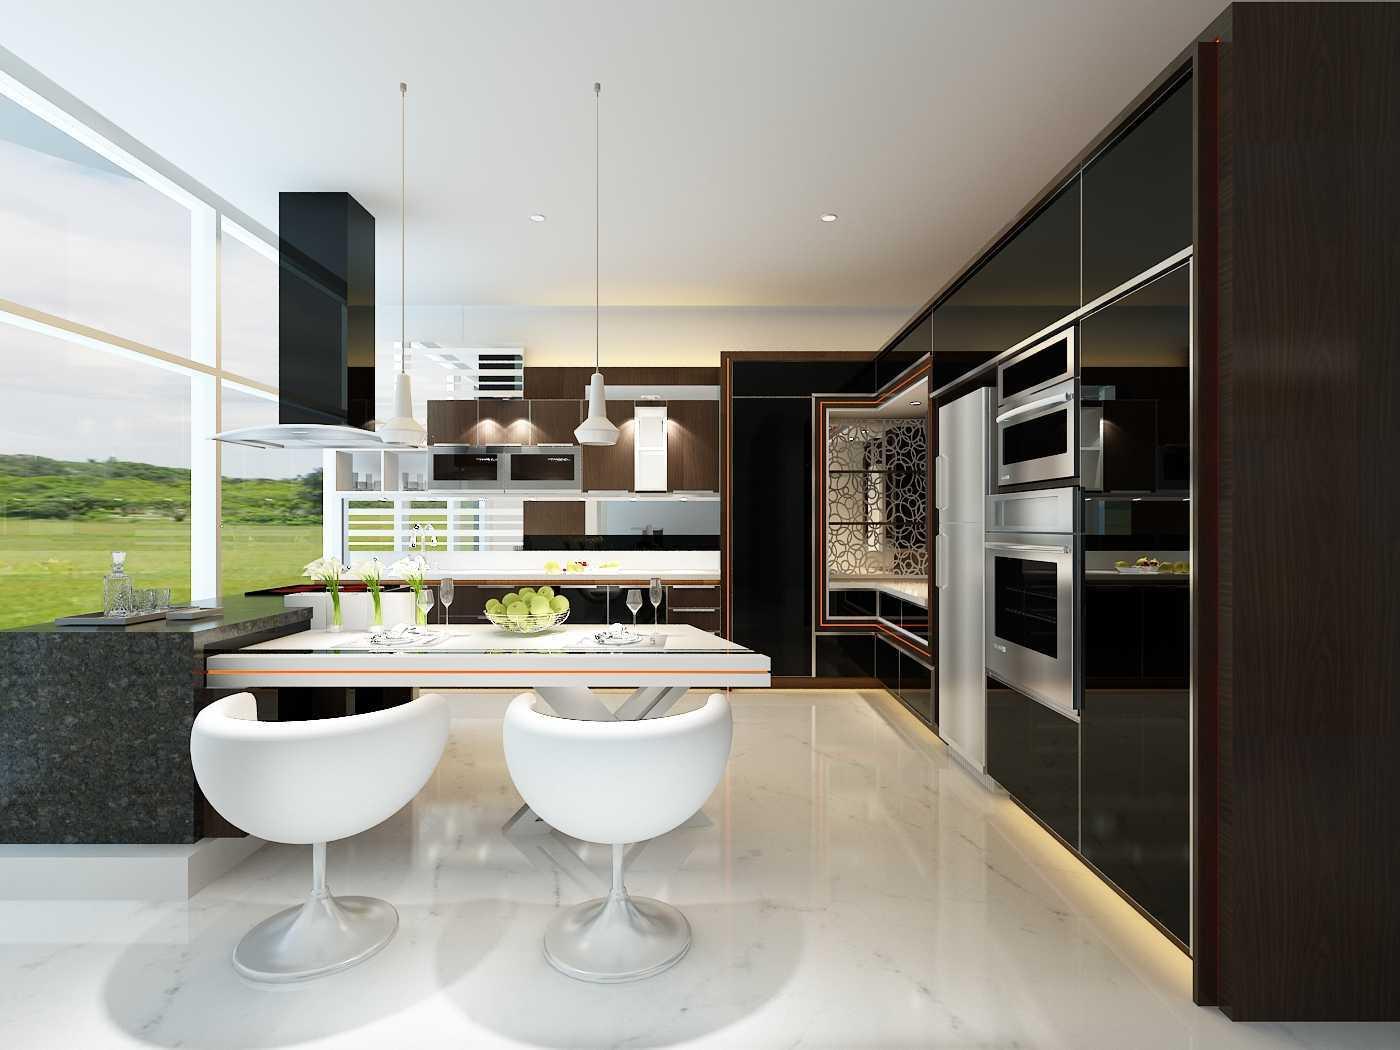 Grande furniture interior architecture modern kitchen alam sutera alam sutera kitchen set 1 30002